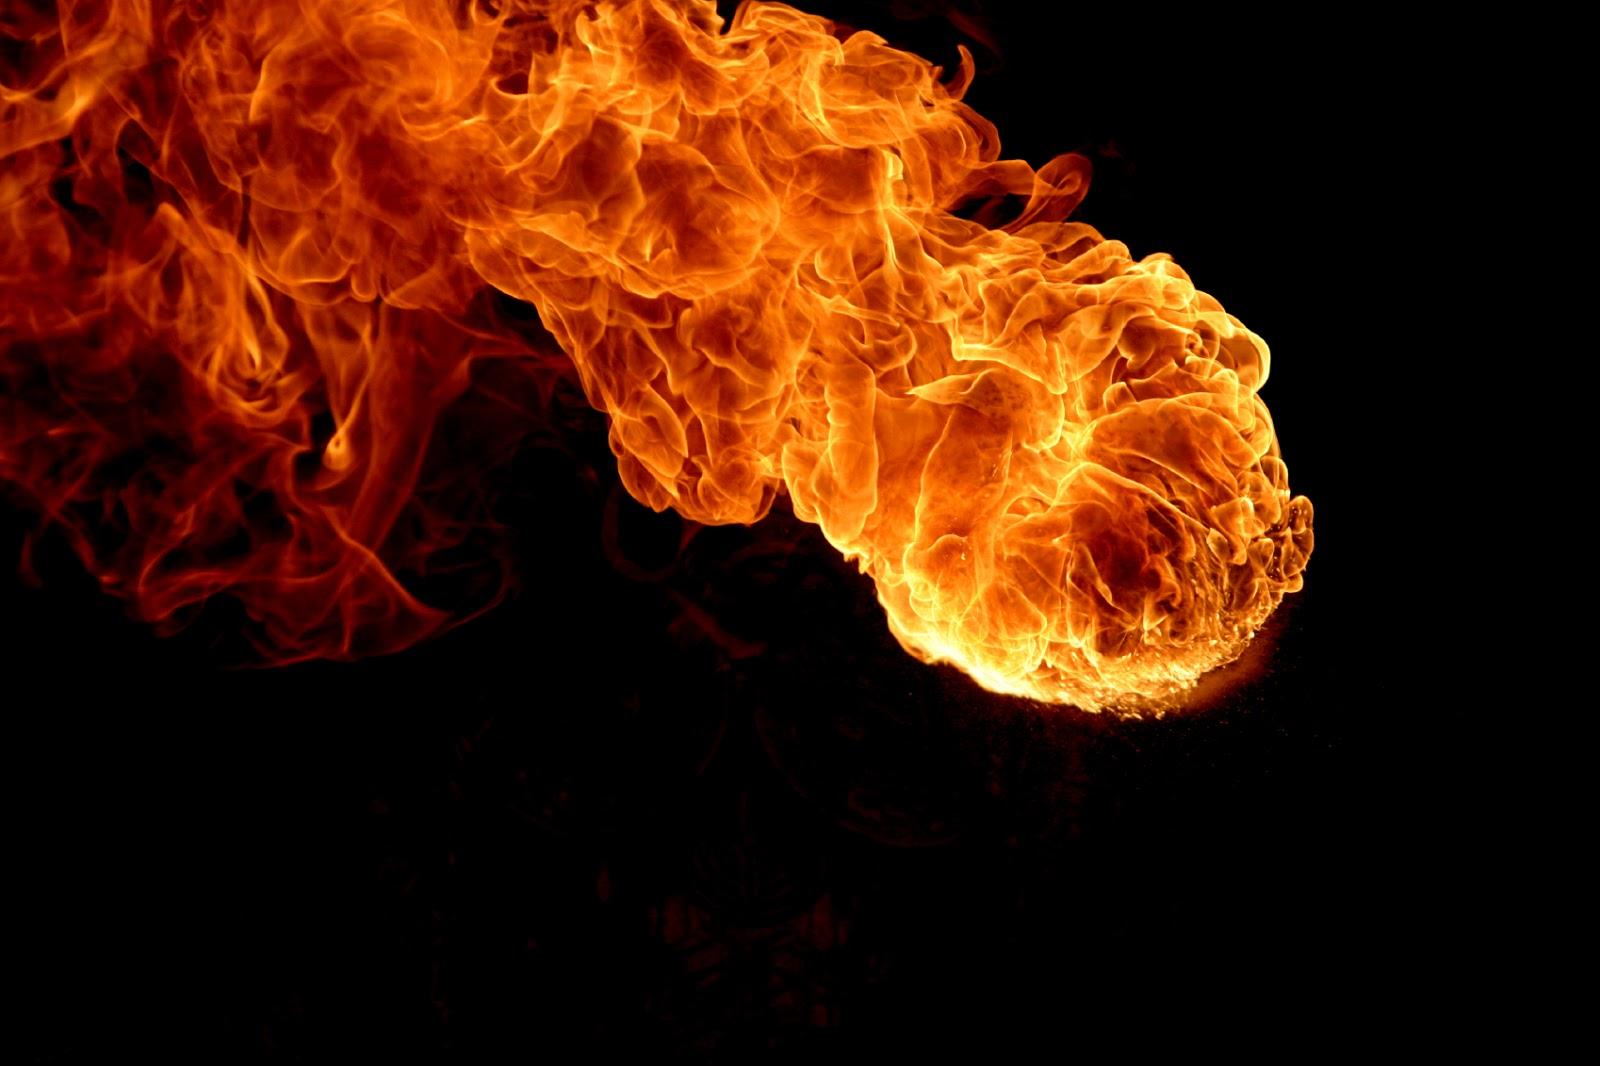 boule de feu wallpaper - photo #37